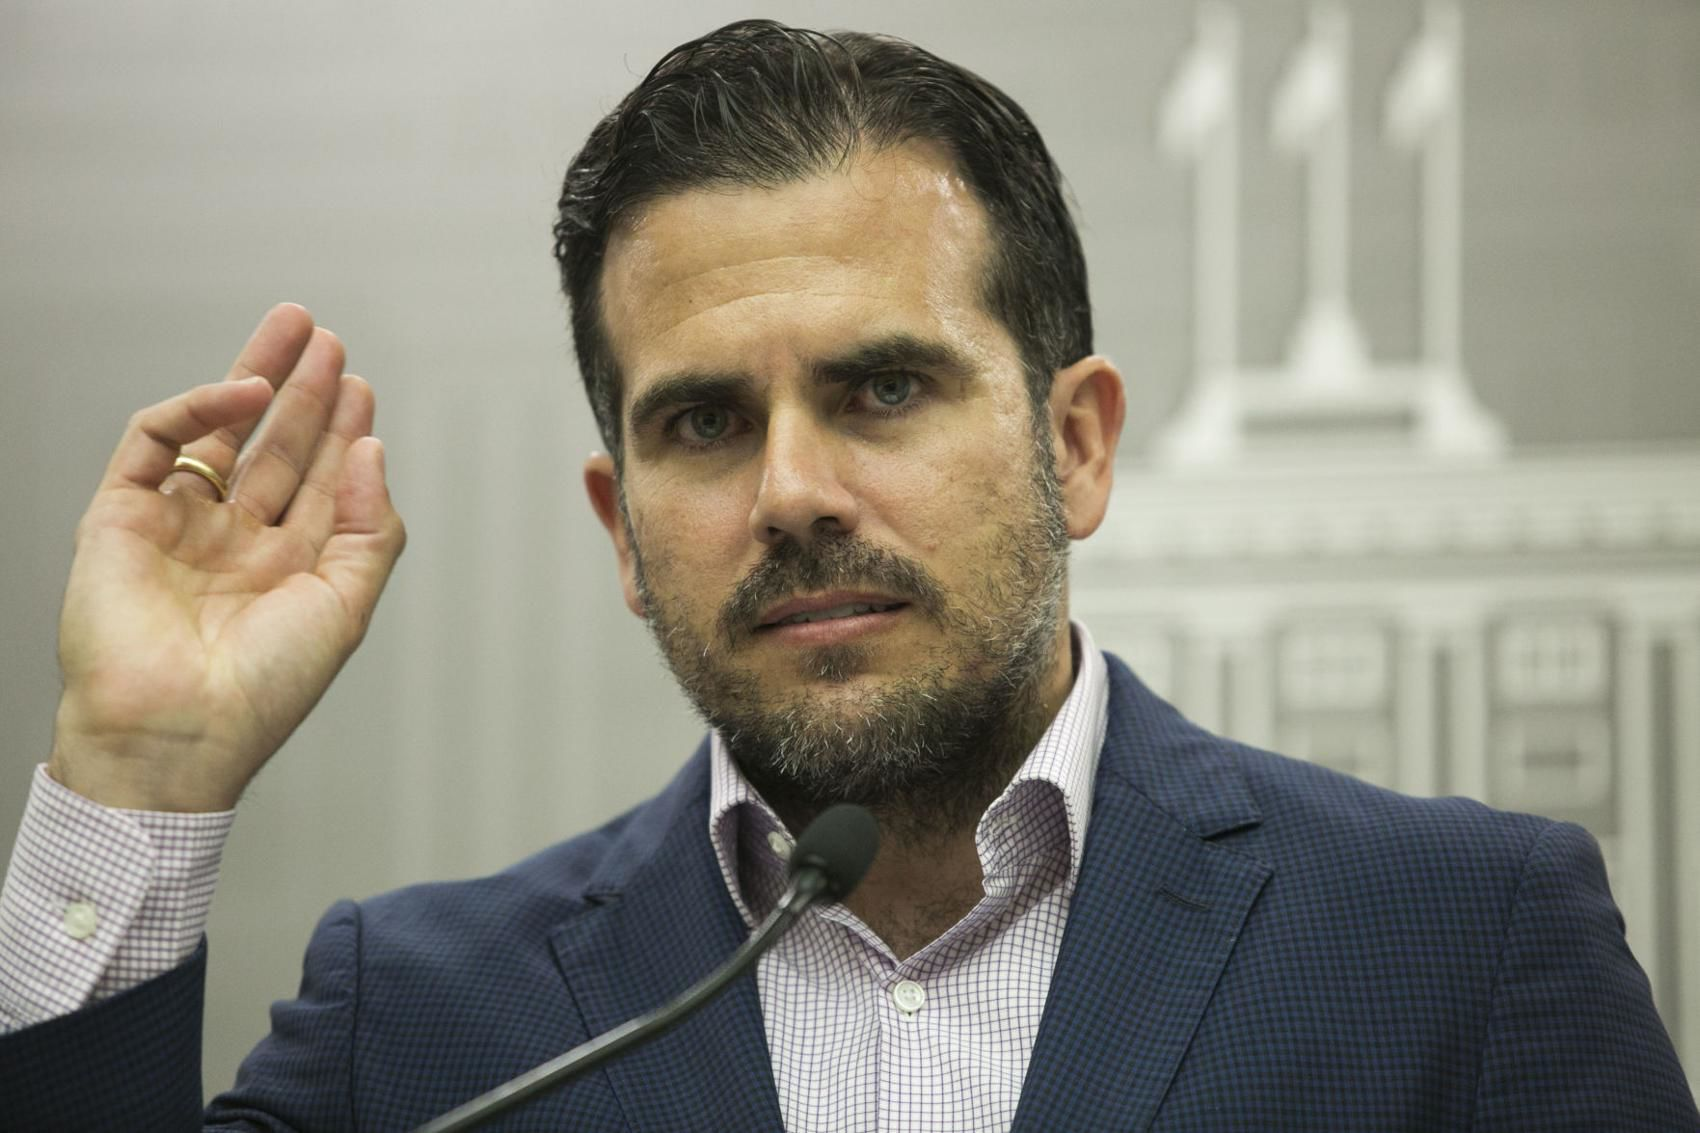 Iglesia Bautista solicita renuncia del gobernador